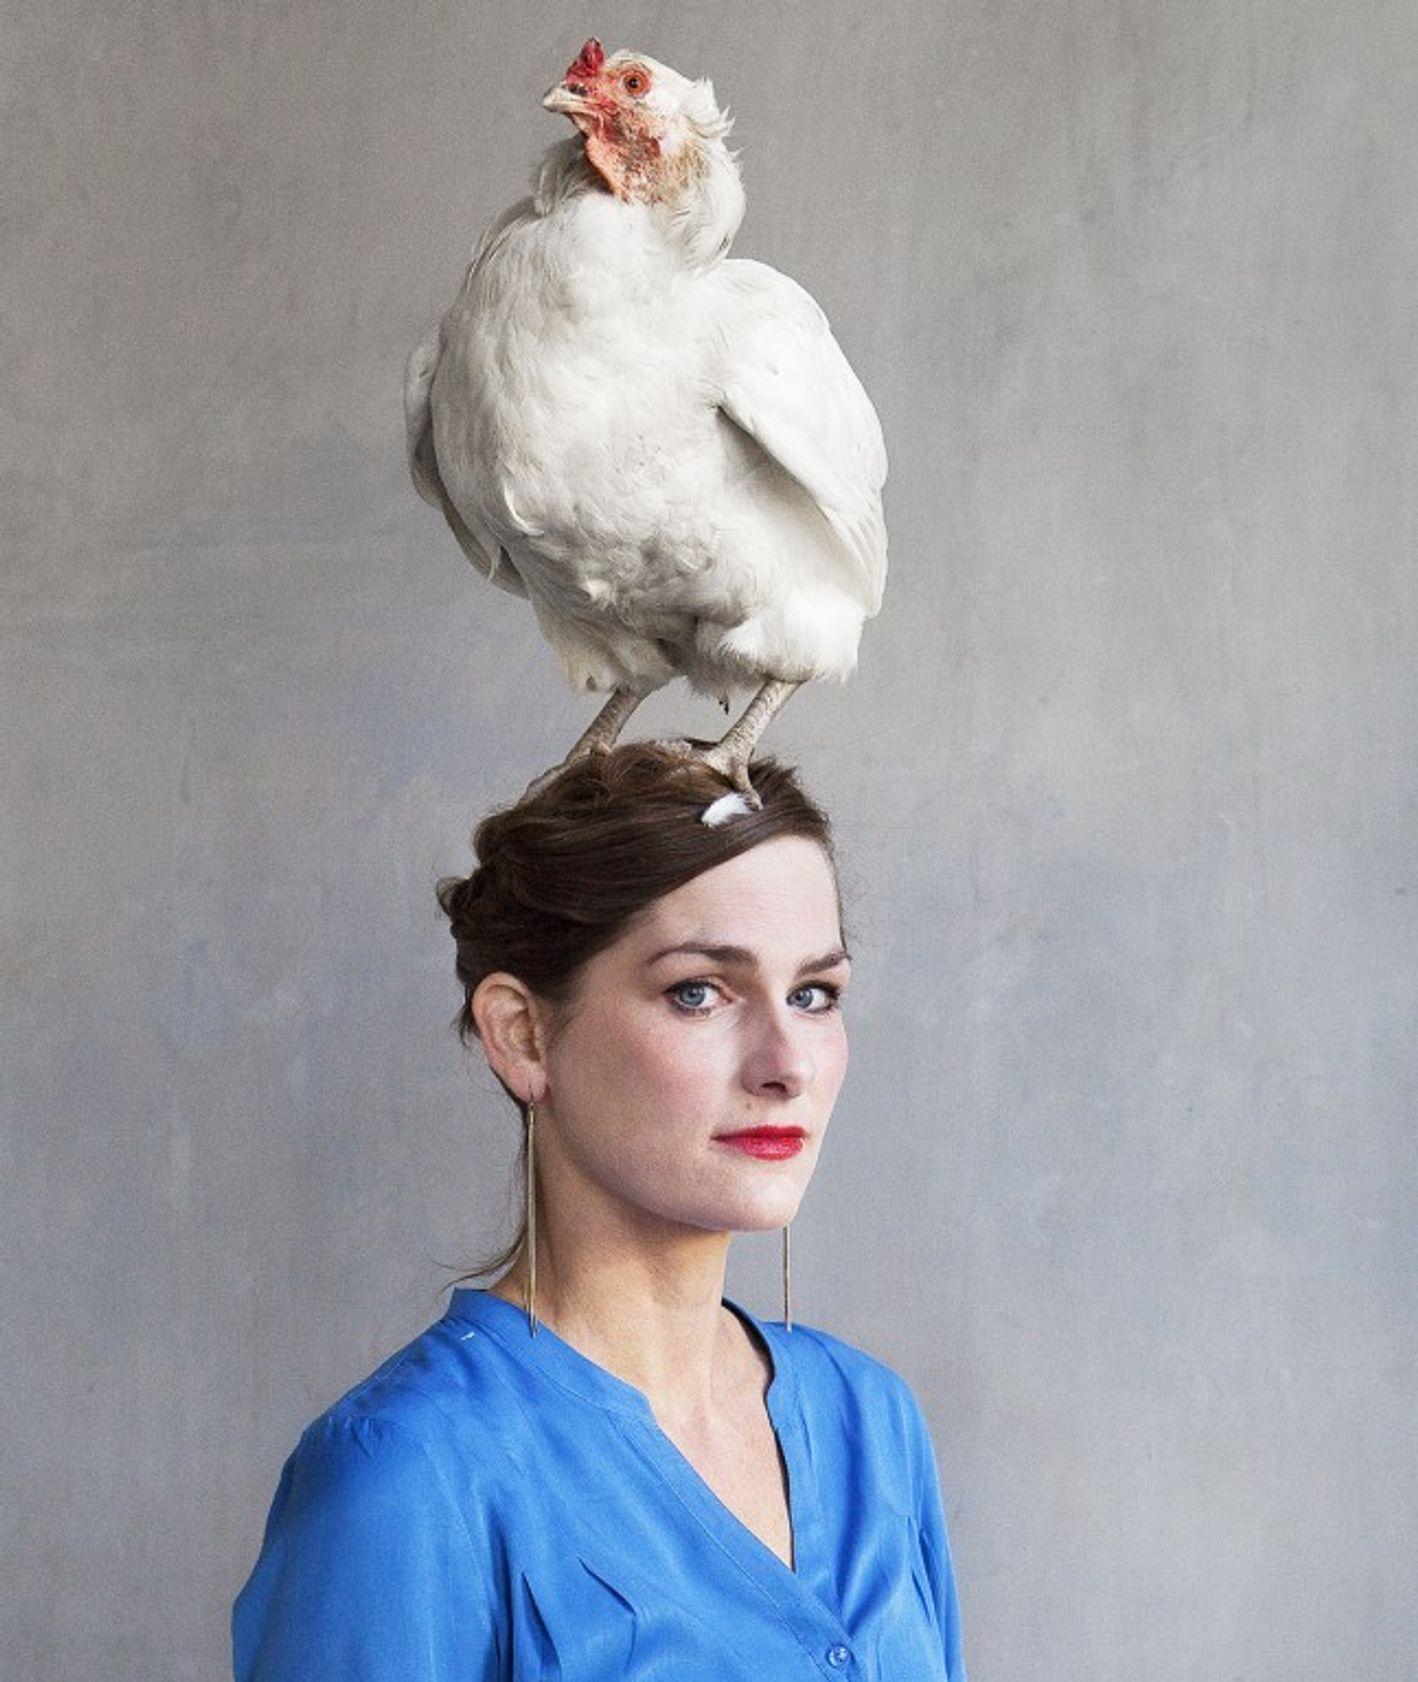 Portret Marije Vogelzang, specjalistki od eating design (fot. materiały prasowe)